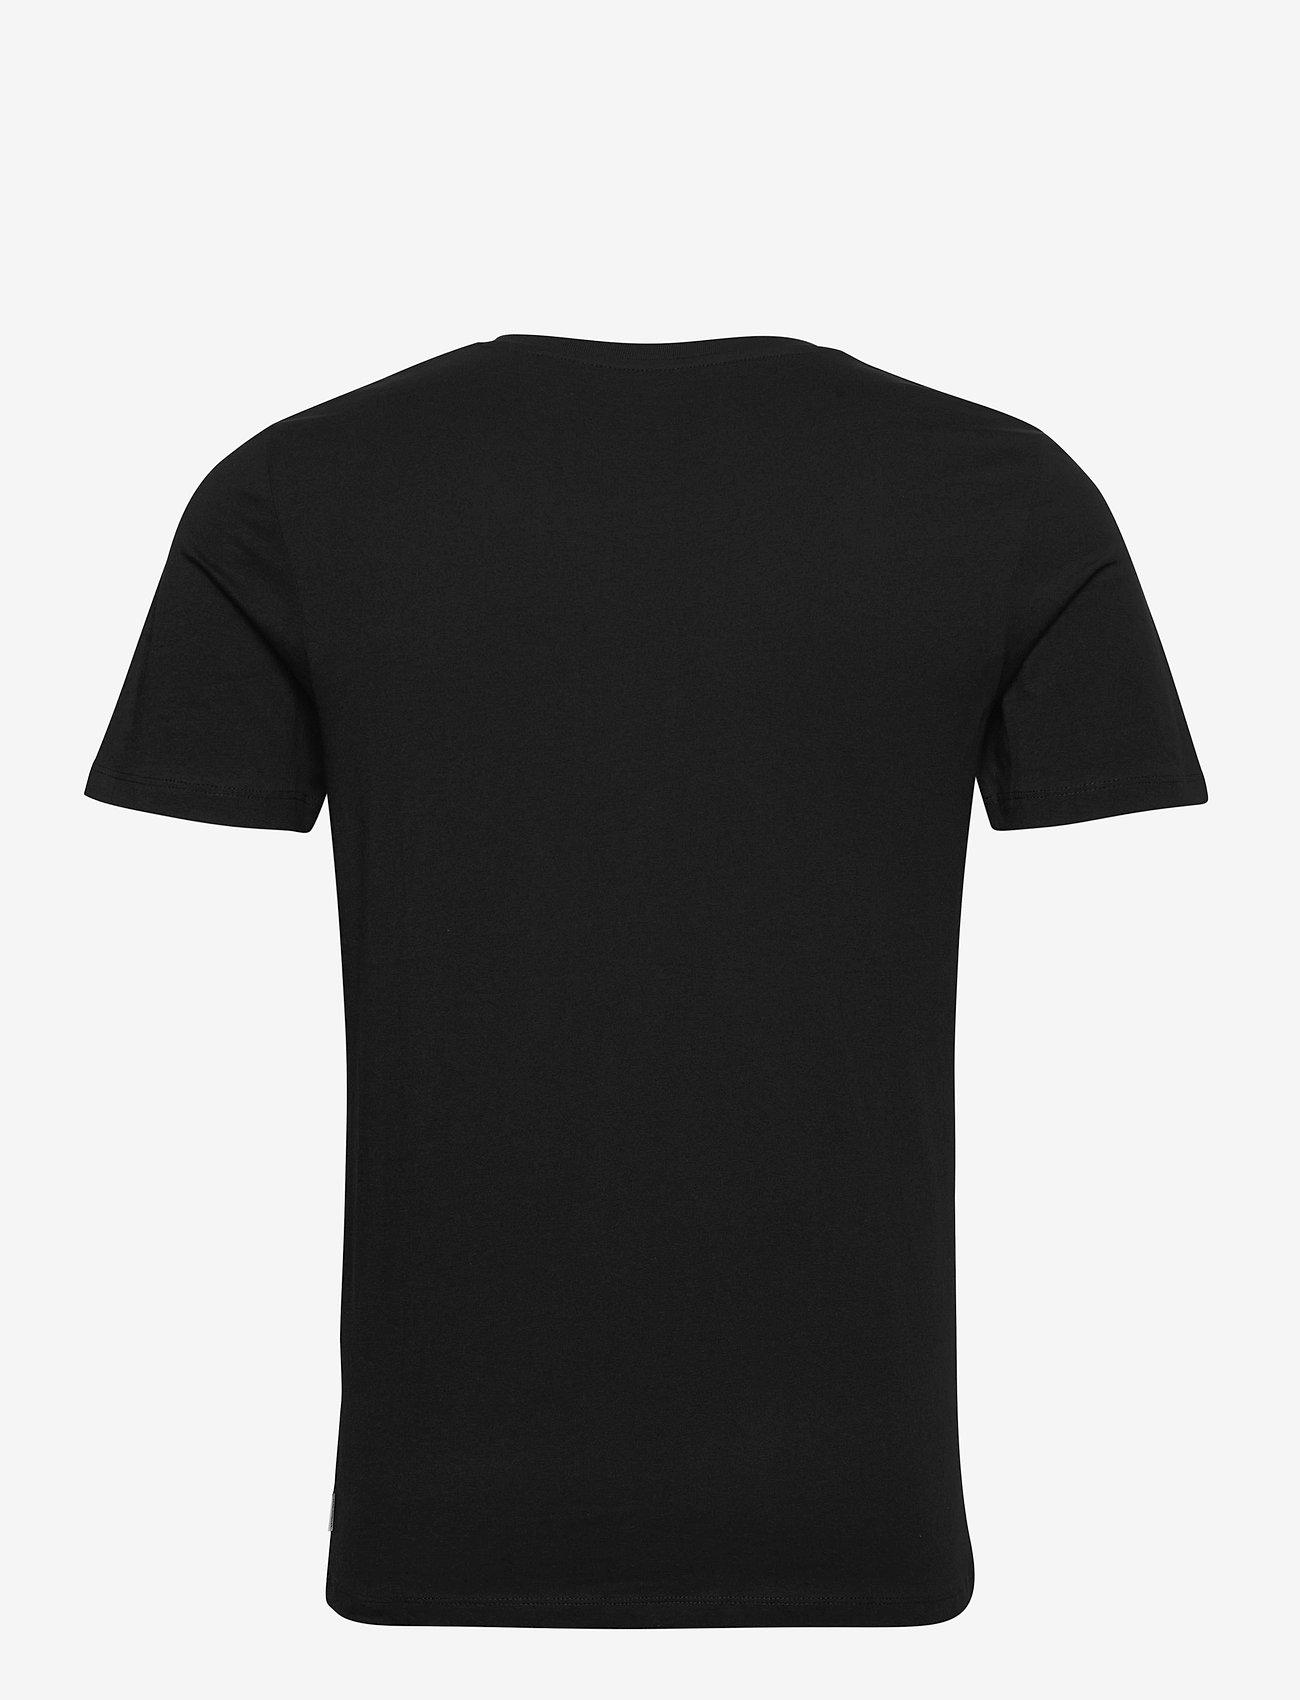 Jack & Jones - JJEORGANIC BASIC TEE SS O-NECK - basic t-shirts - black - 1